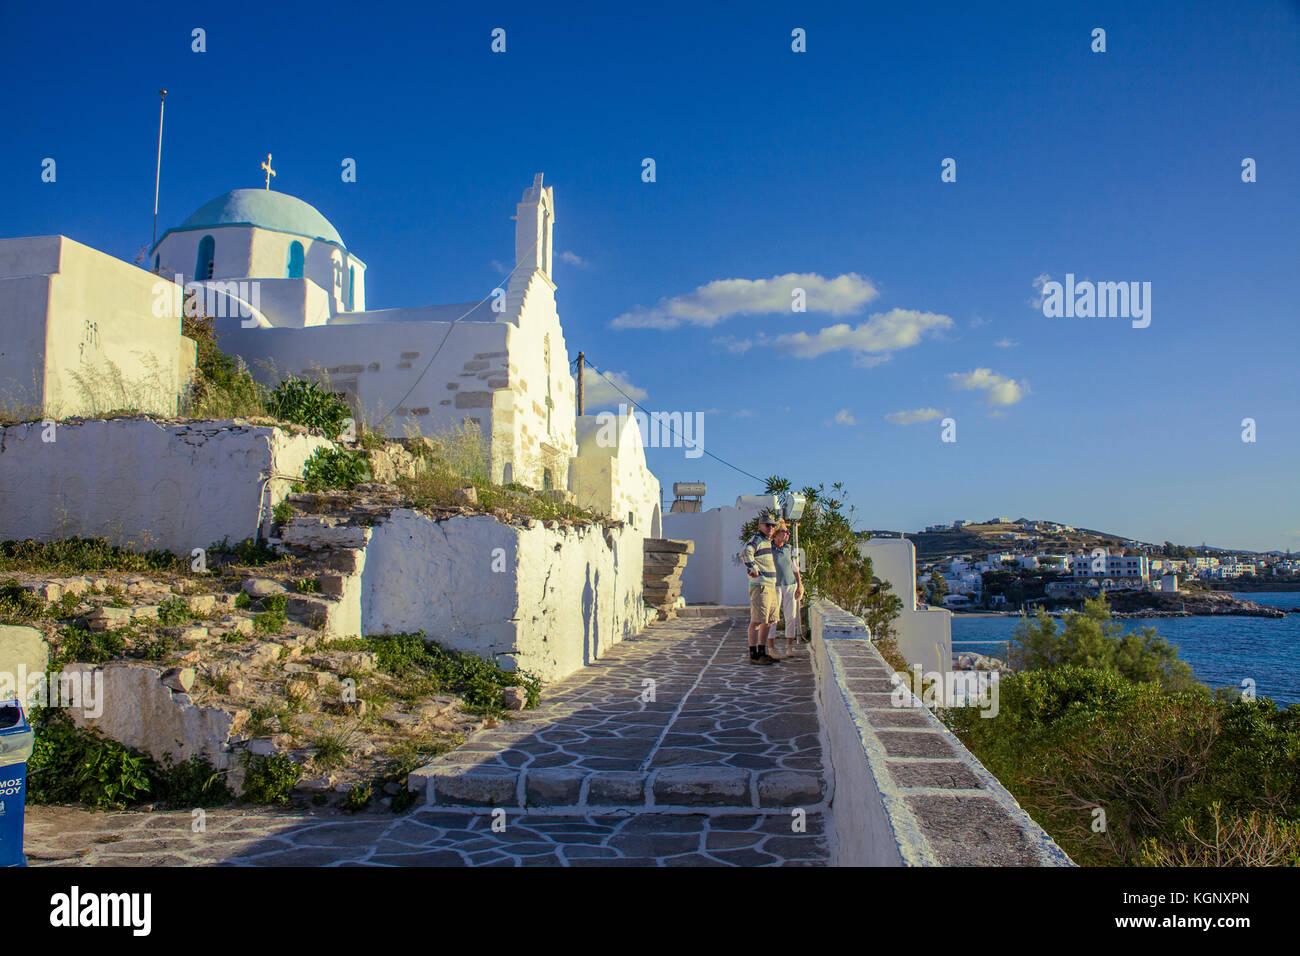 The church Agios Konstantinos and Aghia Eleni at soft evening light, Castro, Parikia, Paros Cyclades, Greece, Mediterranean - Stock Image